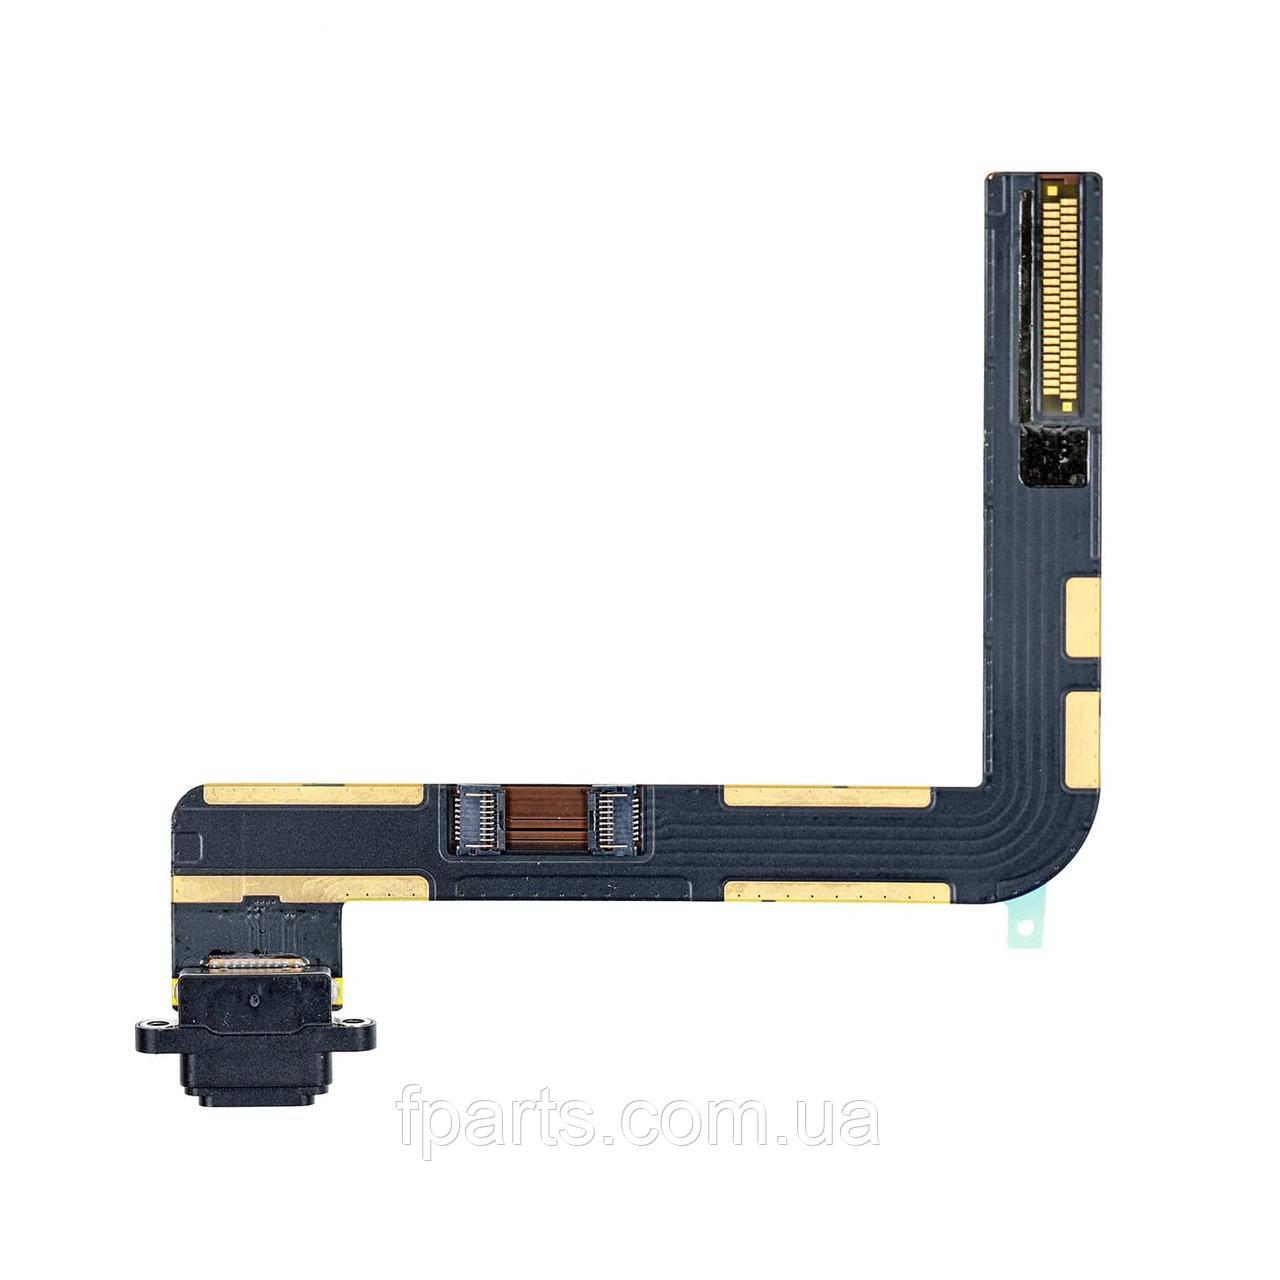 "Шлейф iPad 7 (10.2"" / 2019) (A2197, A2198, A2200) коннектор зарядки, Black"